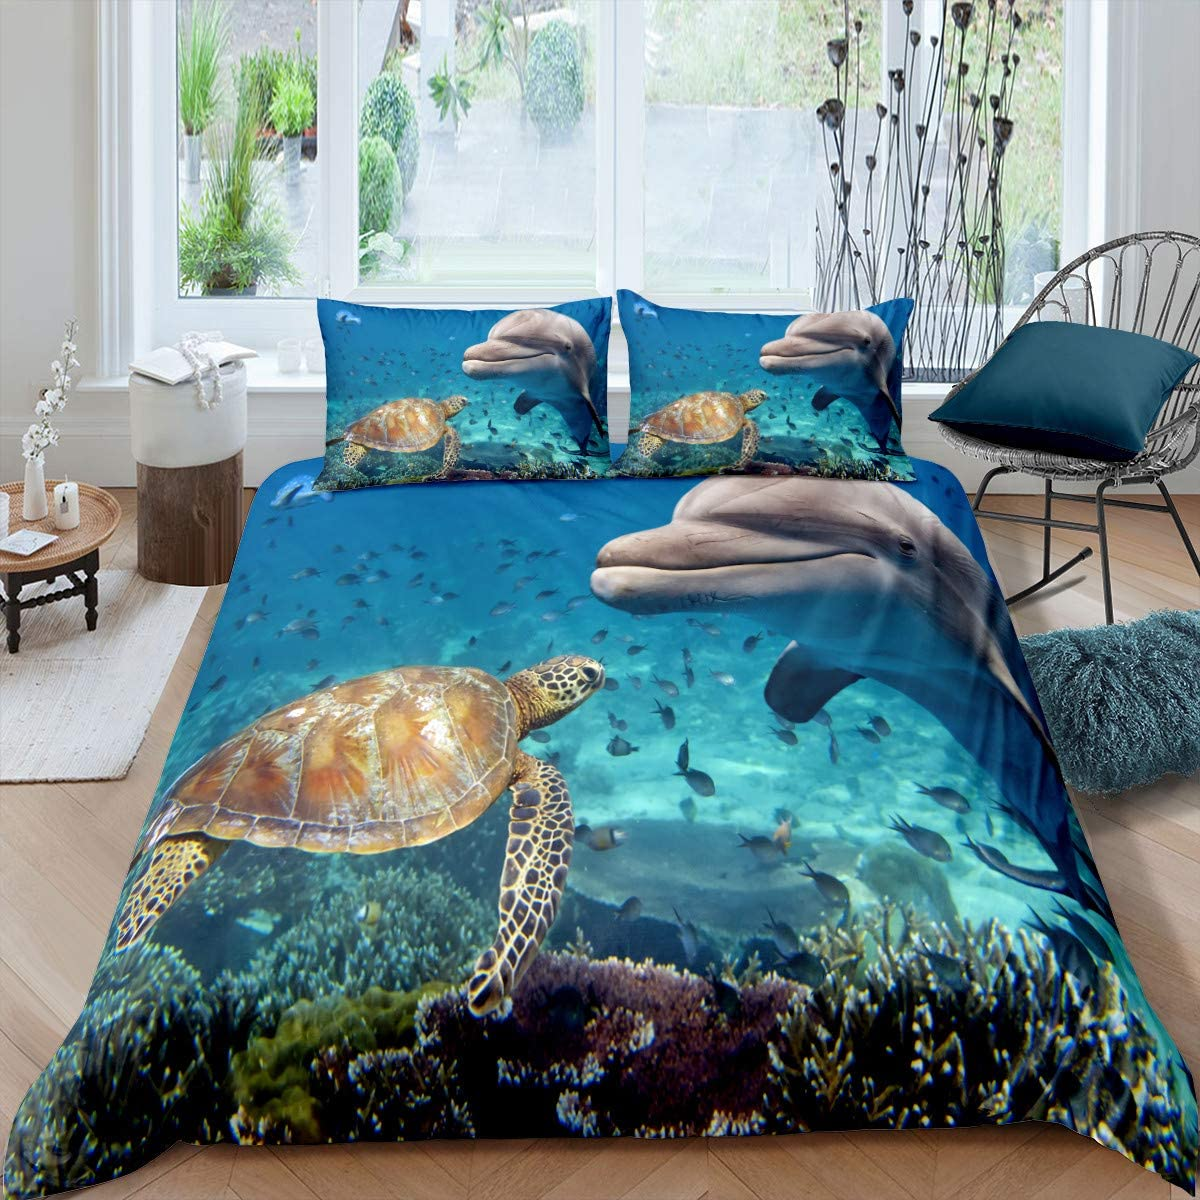 Erosebridal Tortoise Fitted Sheet Deep Pocket for Kids Boys Girls Sea Turtle Bedding Set Ocean Life Animal Sheet Set Full Size Underwater Oasis Bottom Sheet for Teens Adult Grey with 2 Pillow Cases